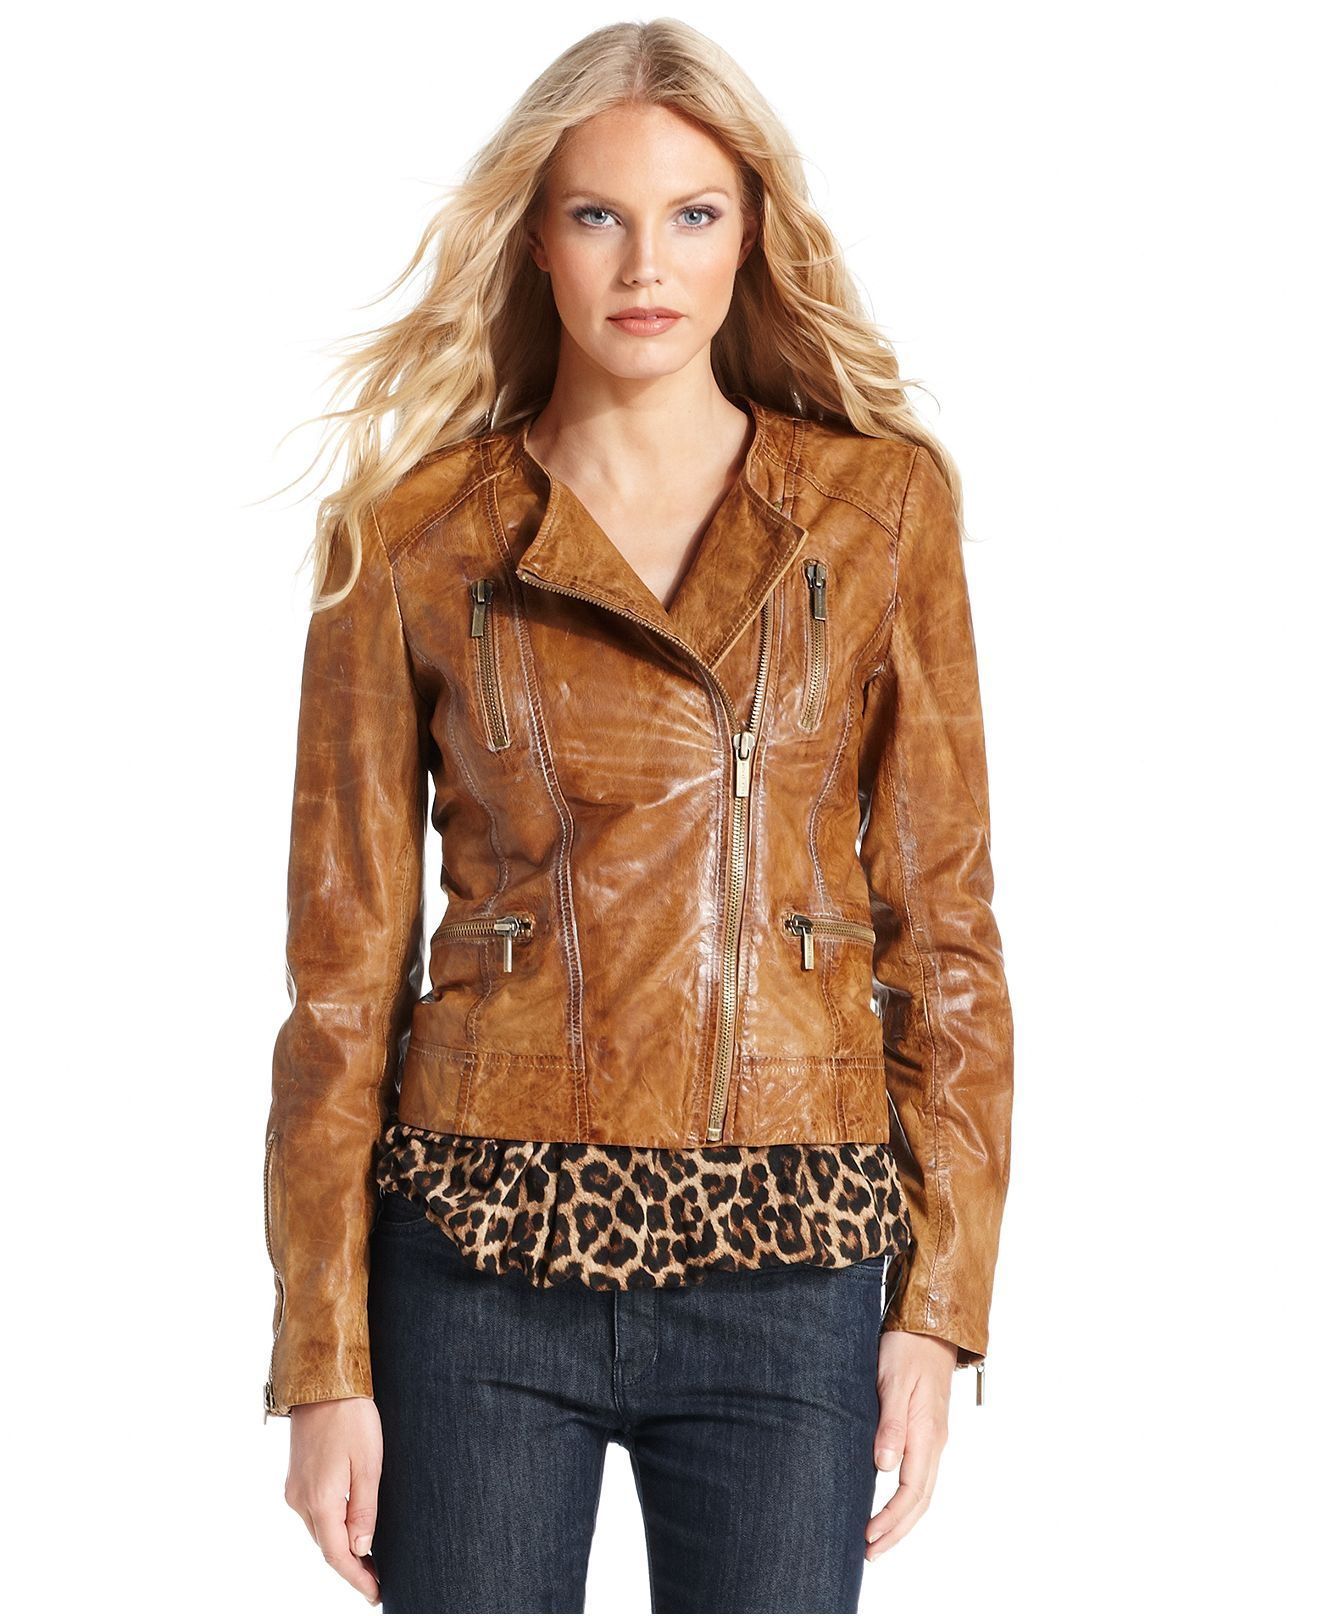 Michael Kors Jacket Distressed Leather Moto Blazer Jackets For Women Leather Jackets Women Stand Collar Jackets [ 1616 x 1320 Pixel ]